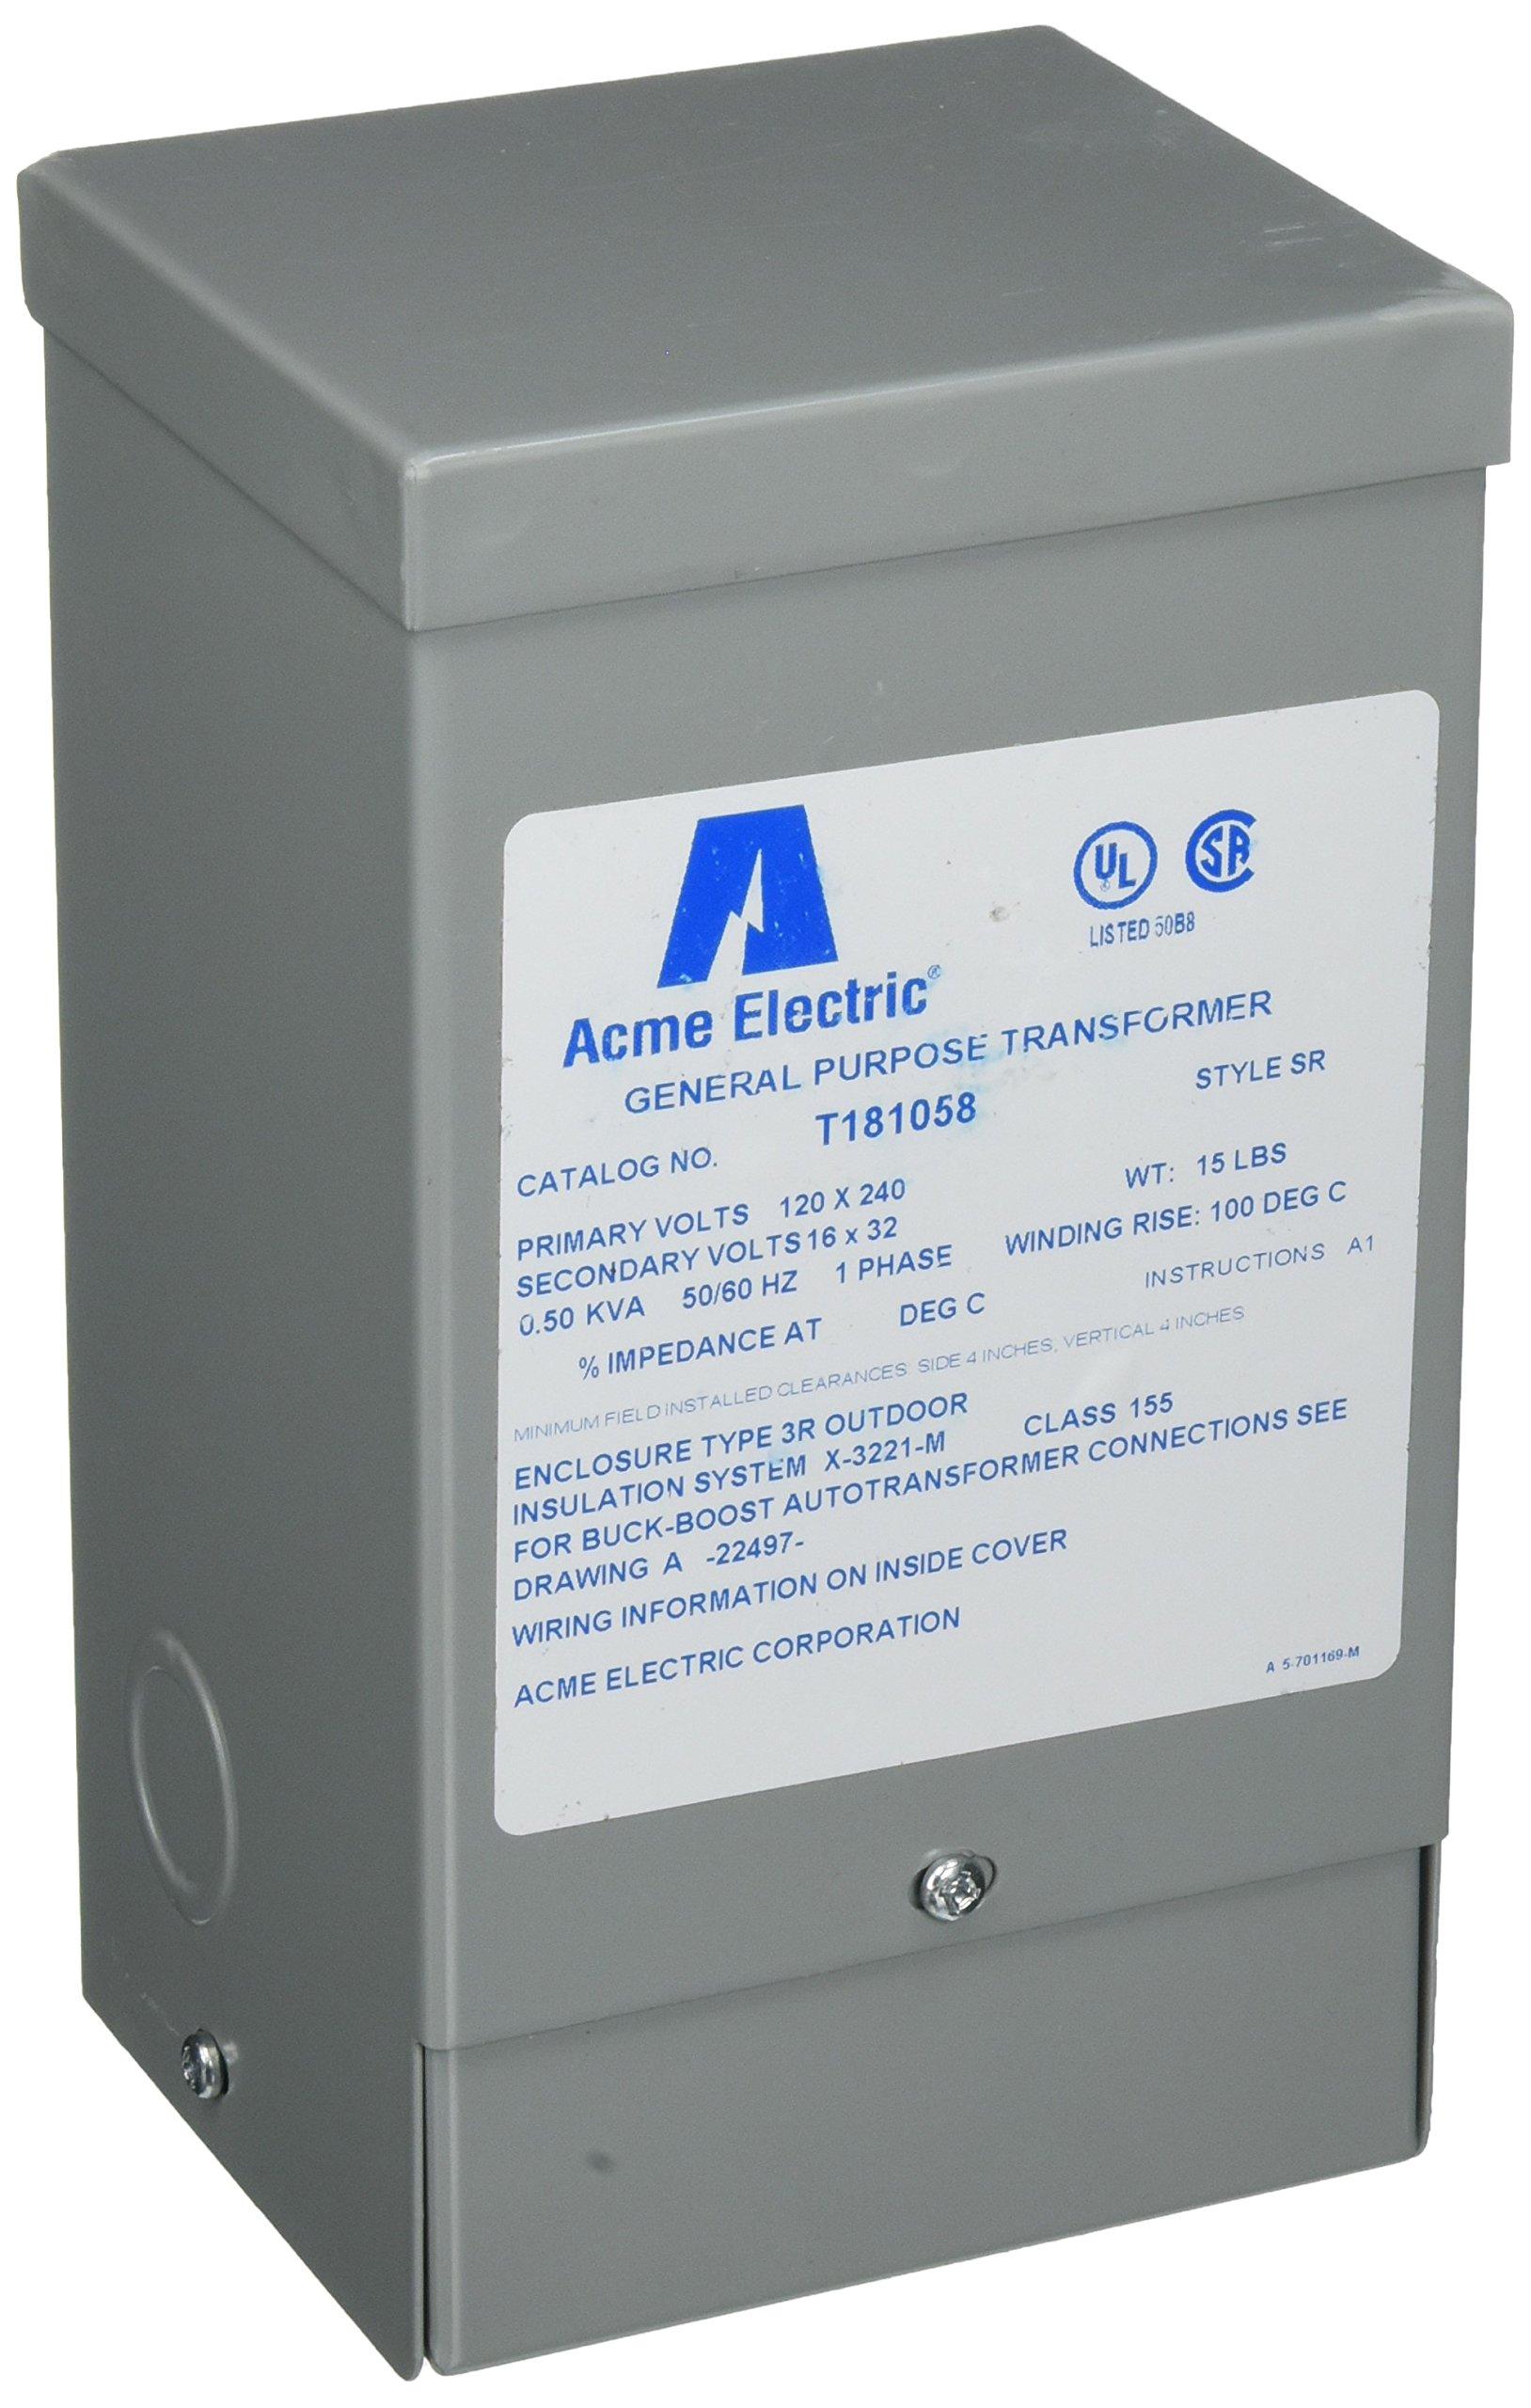 Hubbell Acme Electric T181058 Buck-Boost Transformer, 1 Phase, 60 Hz, 0.5 kVA, 120V x 240V Primary Volts, 16V/32V Secondary Volts